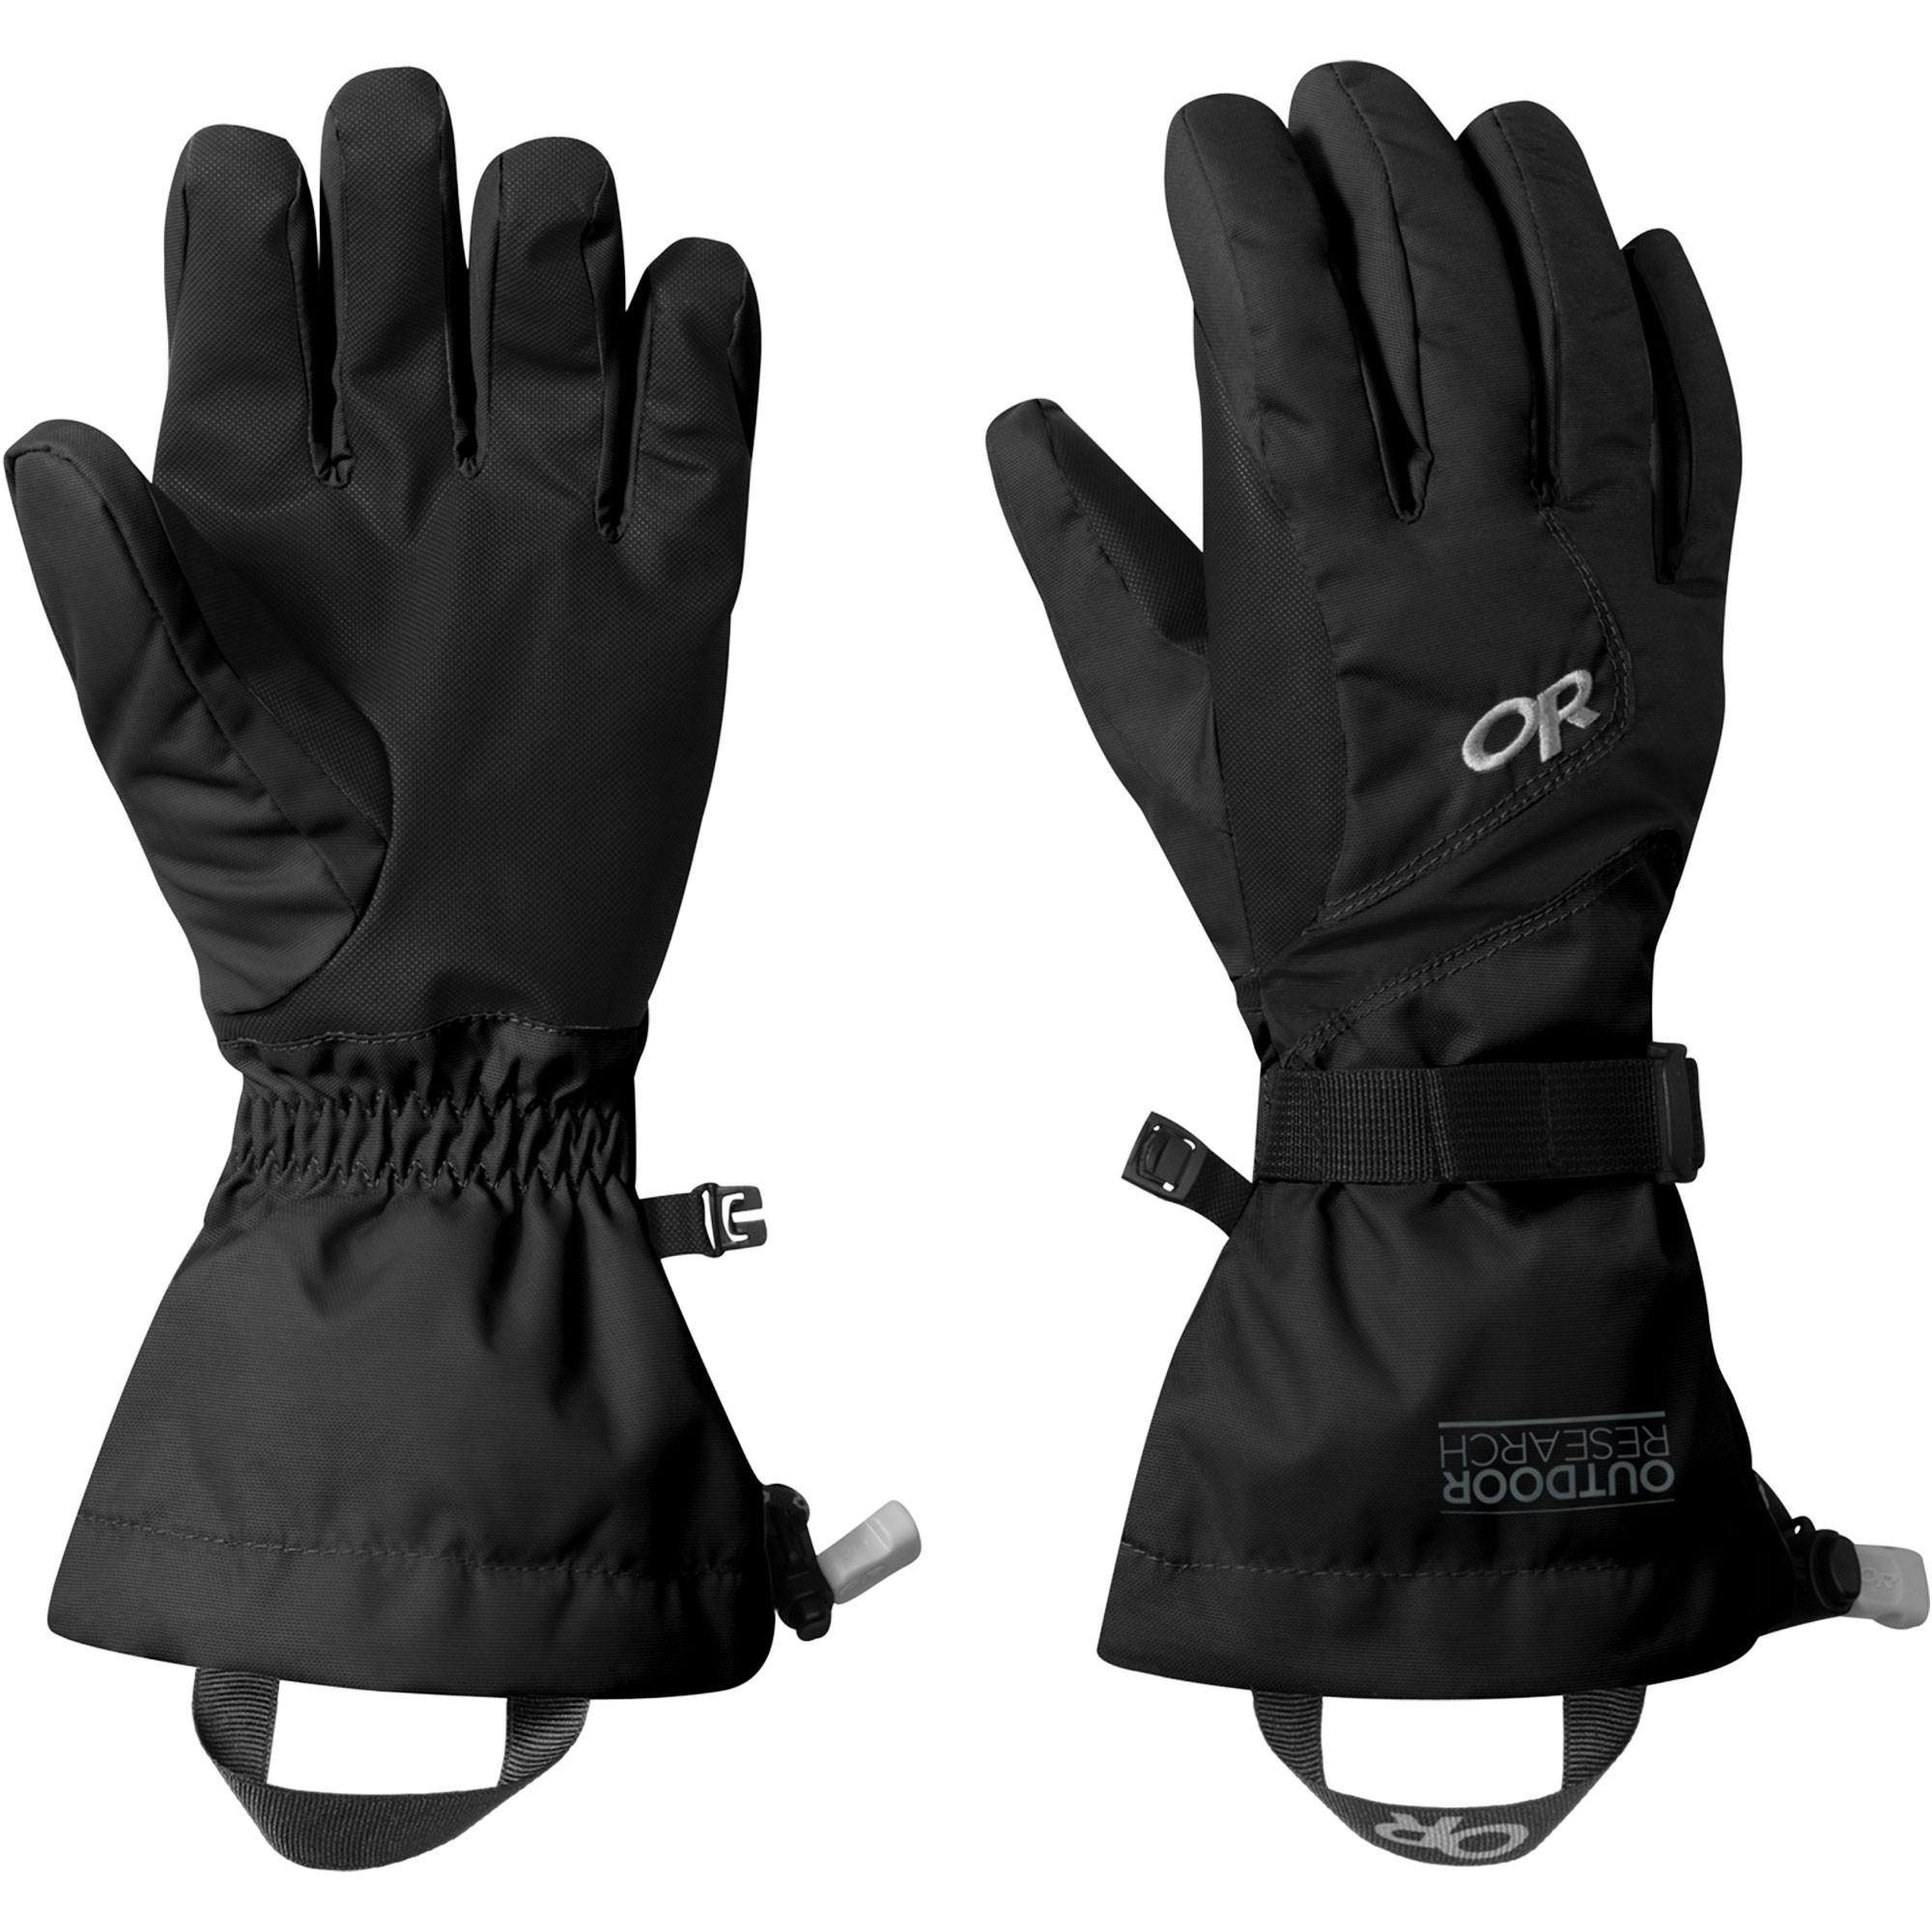 Outdoor-Research-Adrenaline-Glove-Womens-Black-W17